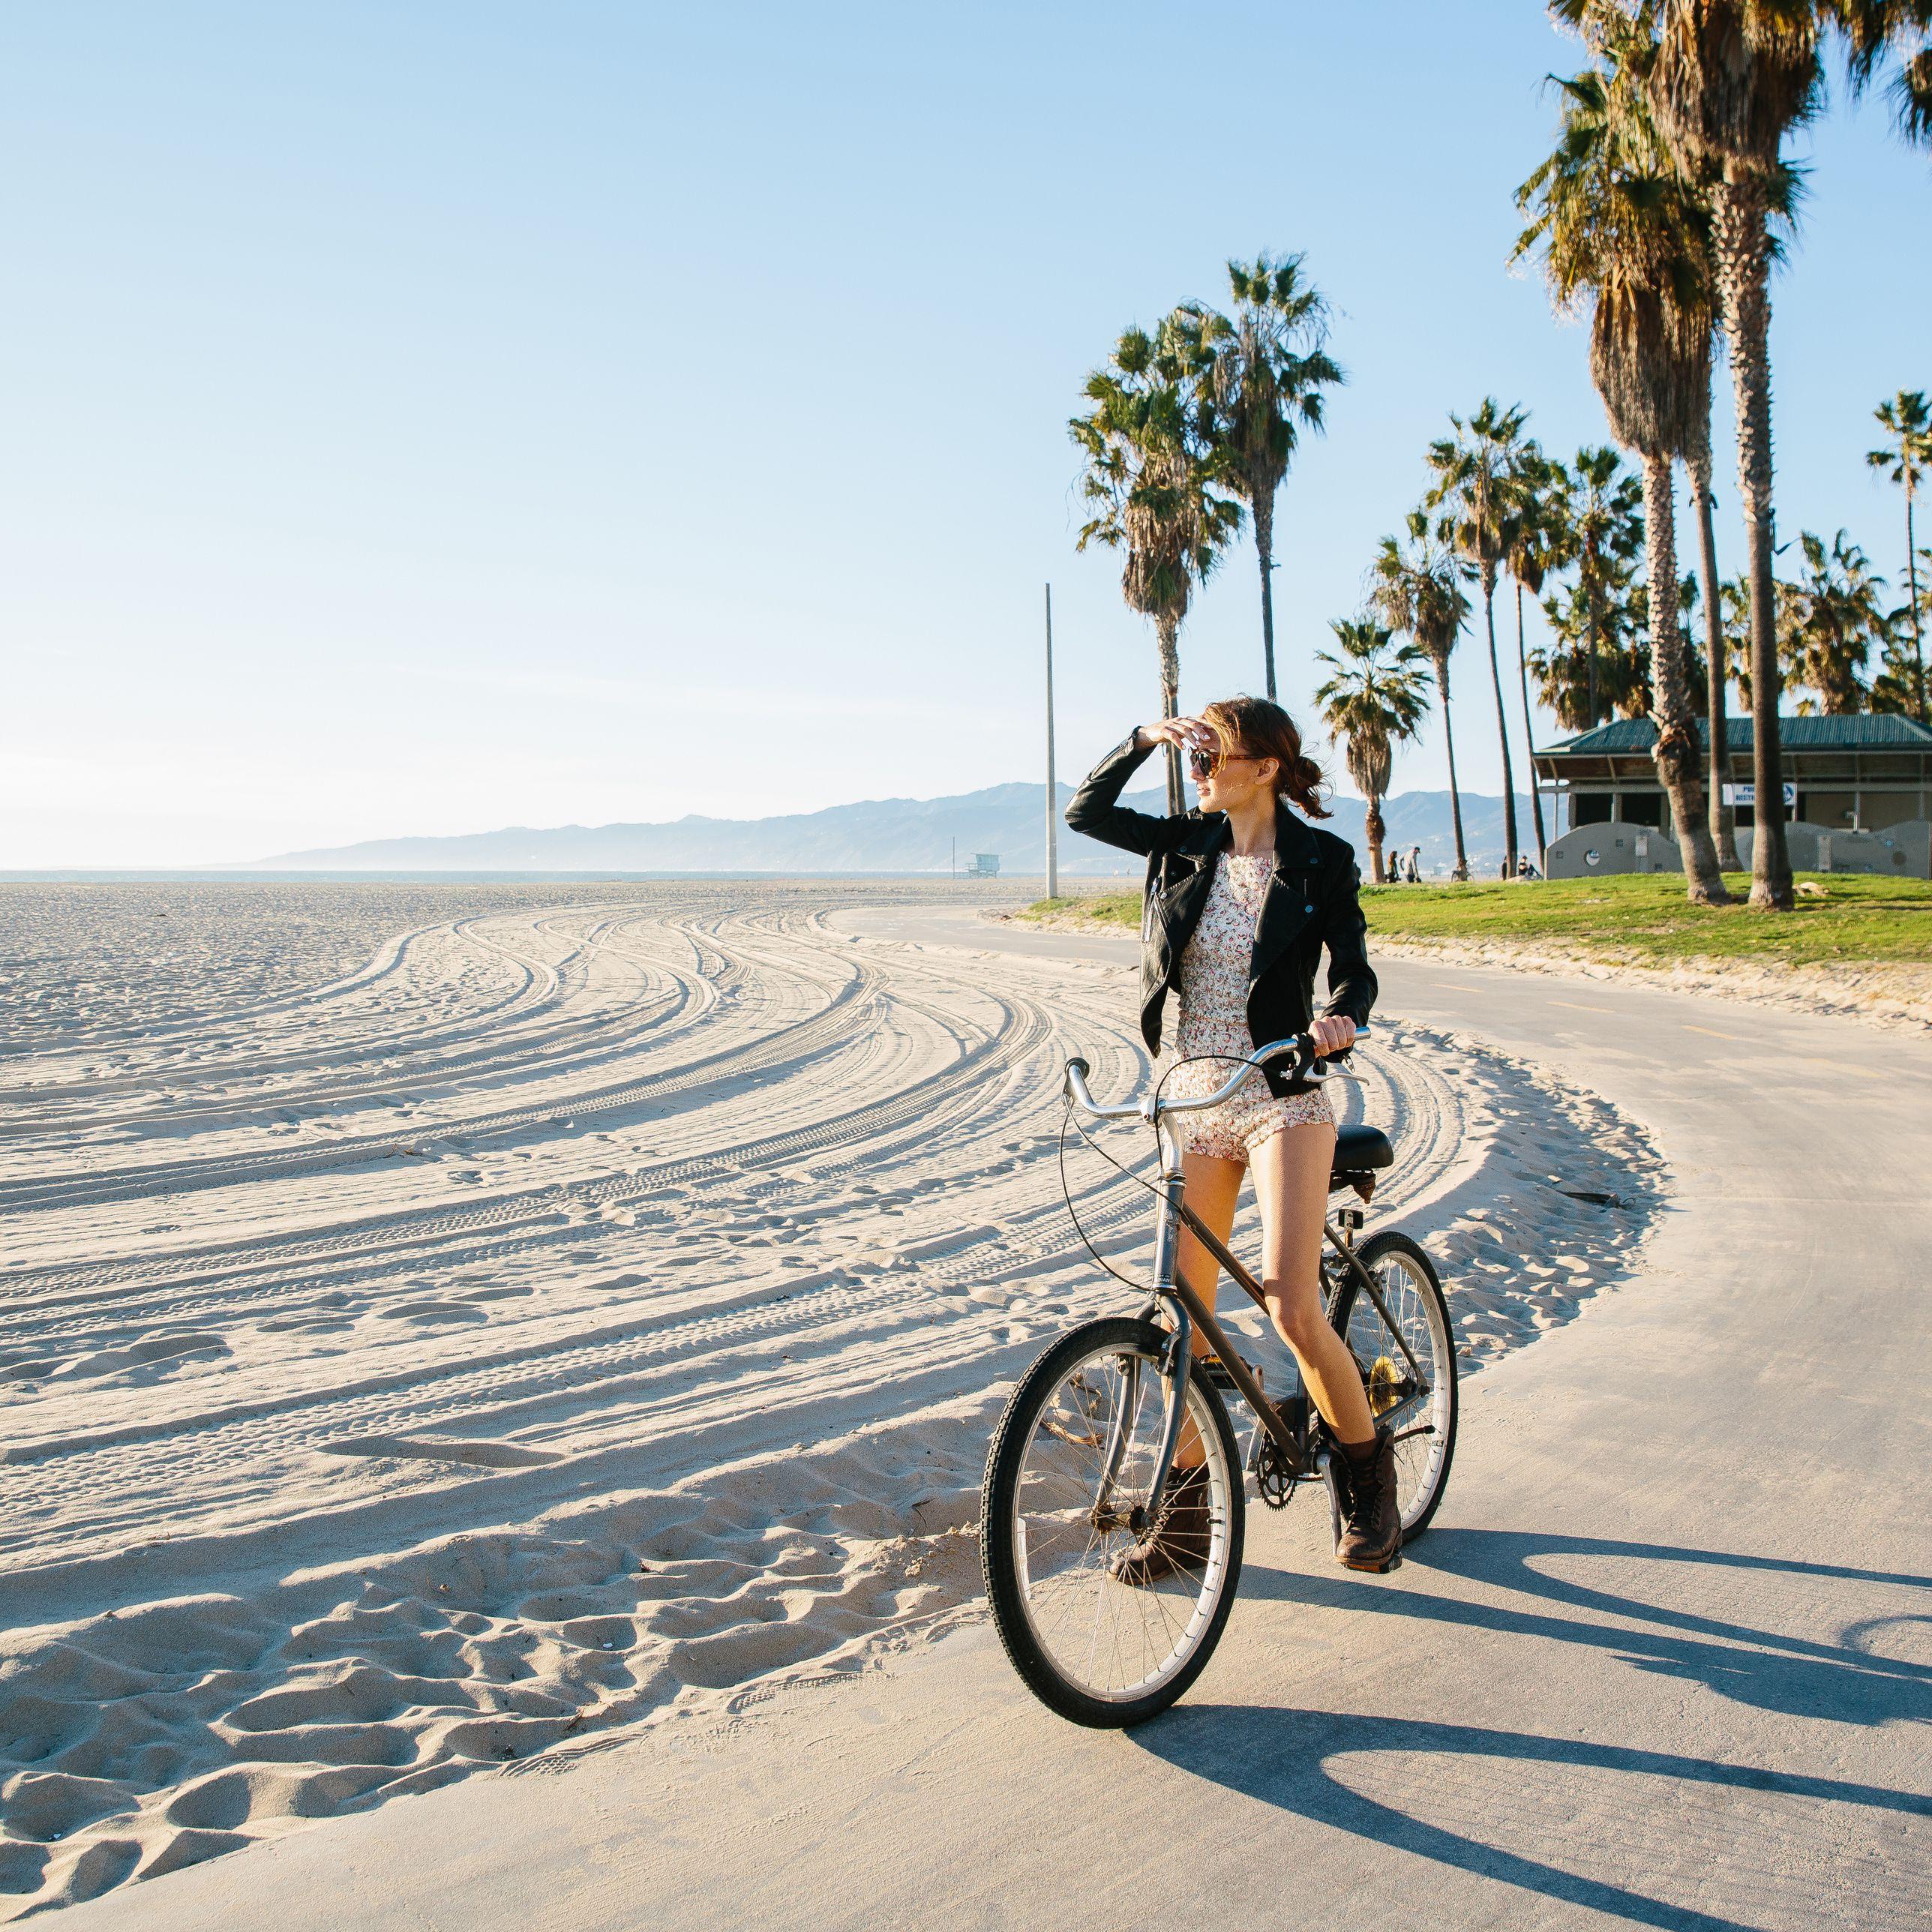 Los Angeles Beach Bike Rentals